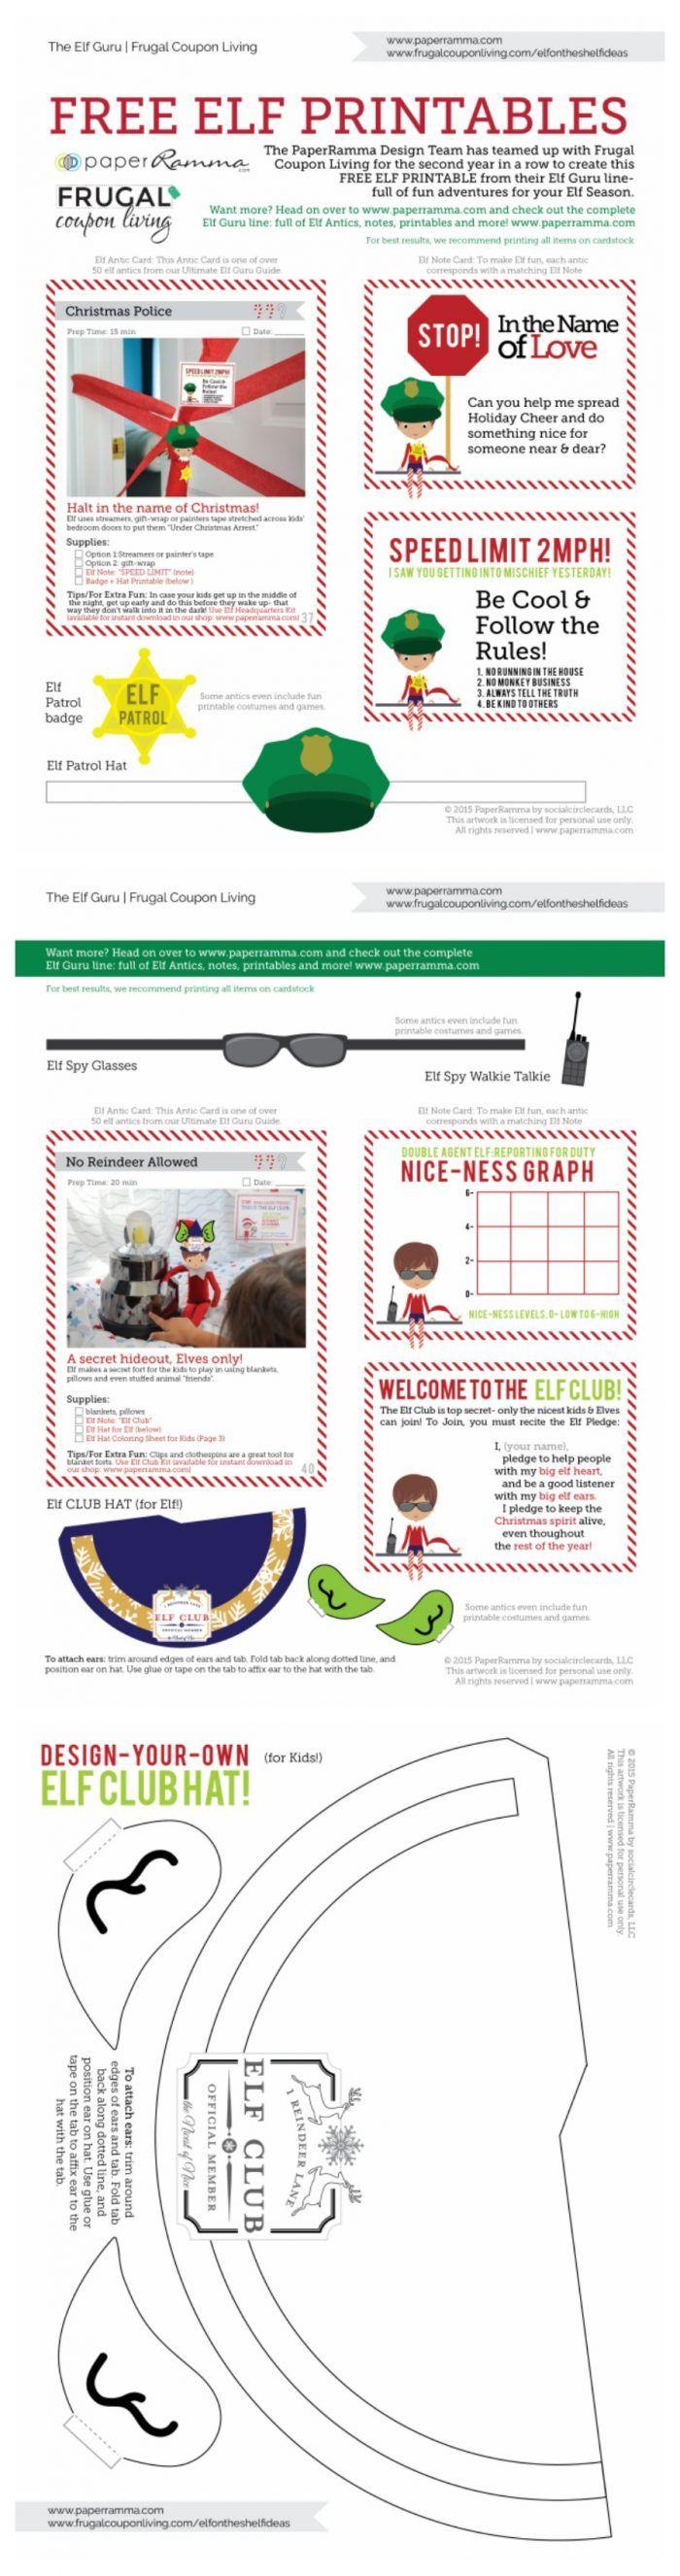 Elf on the Shelf Ideas | Elf Twister Printable